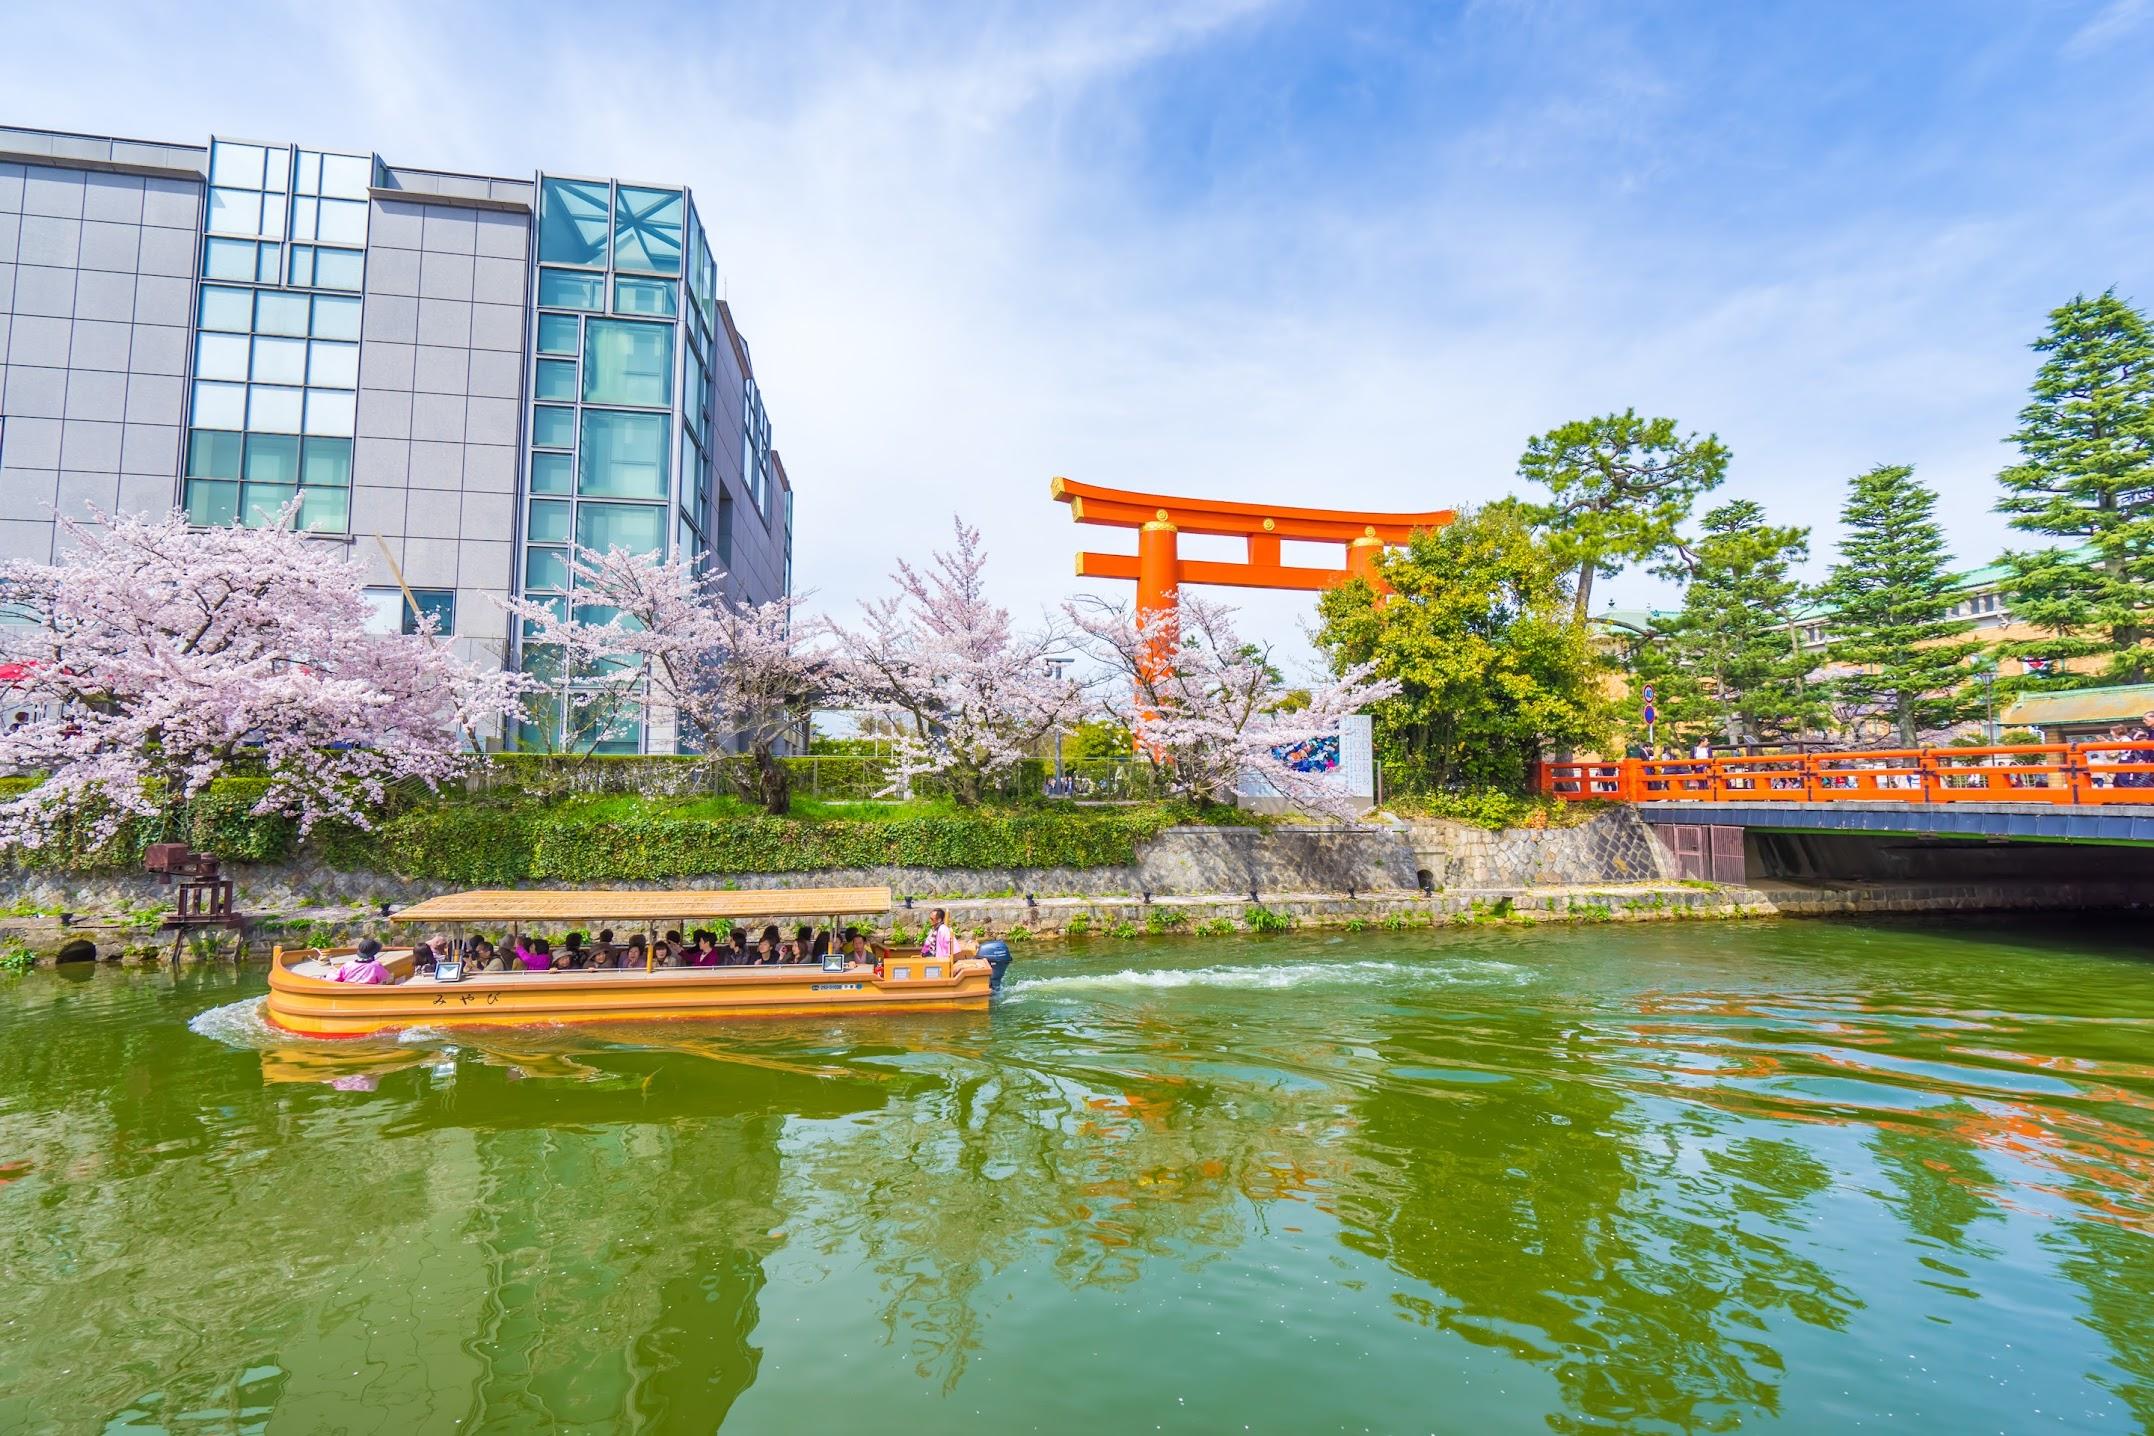 Kyoto okazaki canal cherry blossoms1